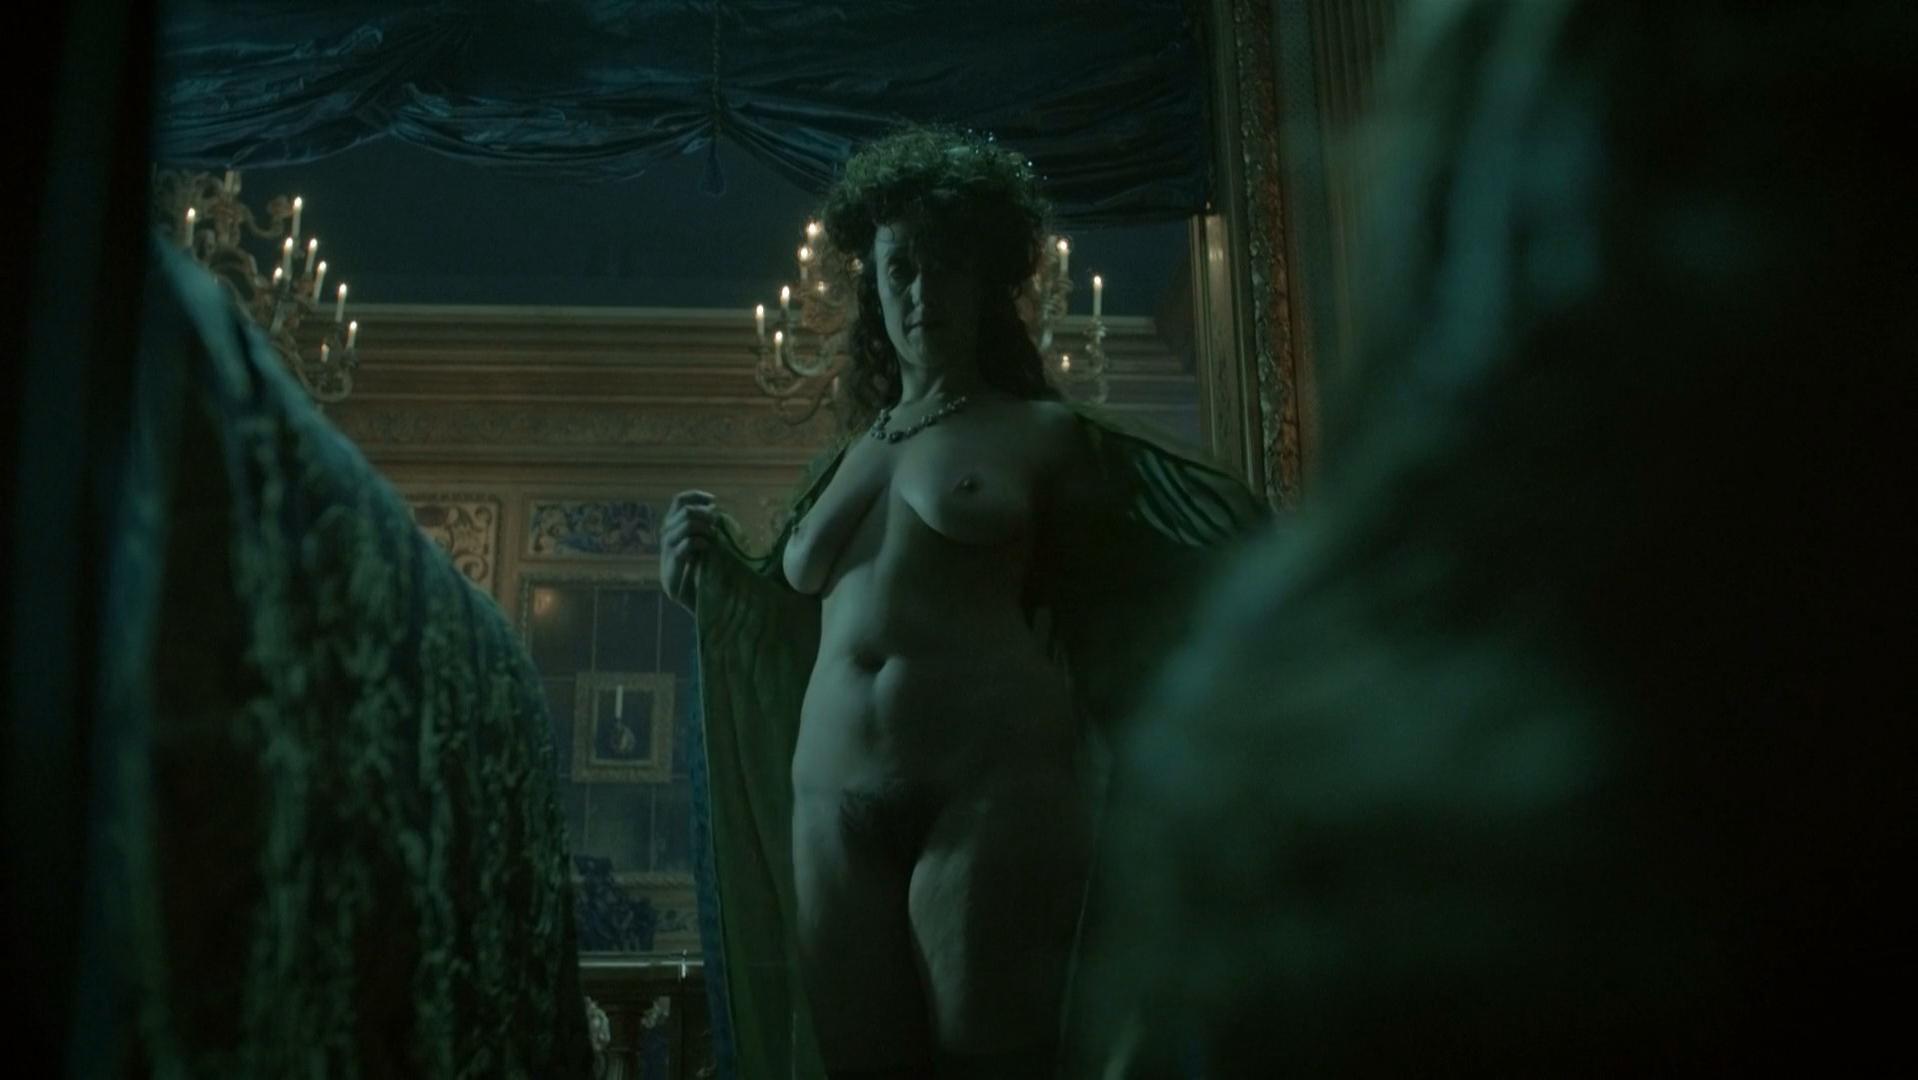 Alexia Giordano nude, Maddison Jaizani nude, Valerie Thoumire nude - Versailles s01e01-03 (2015)